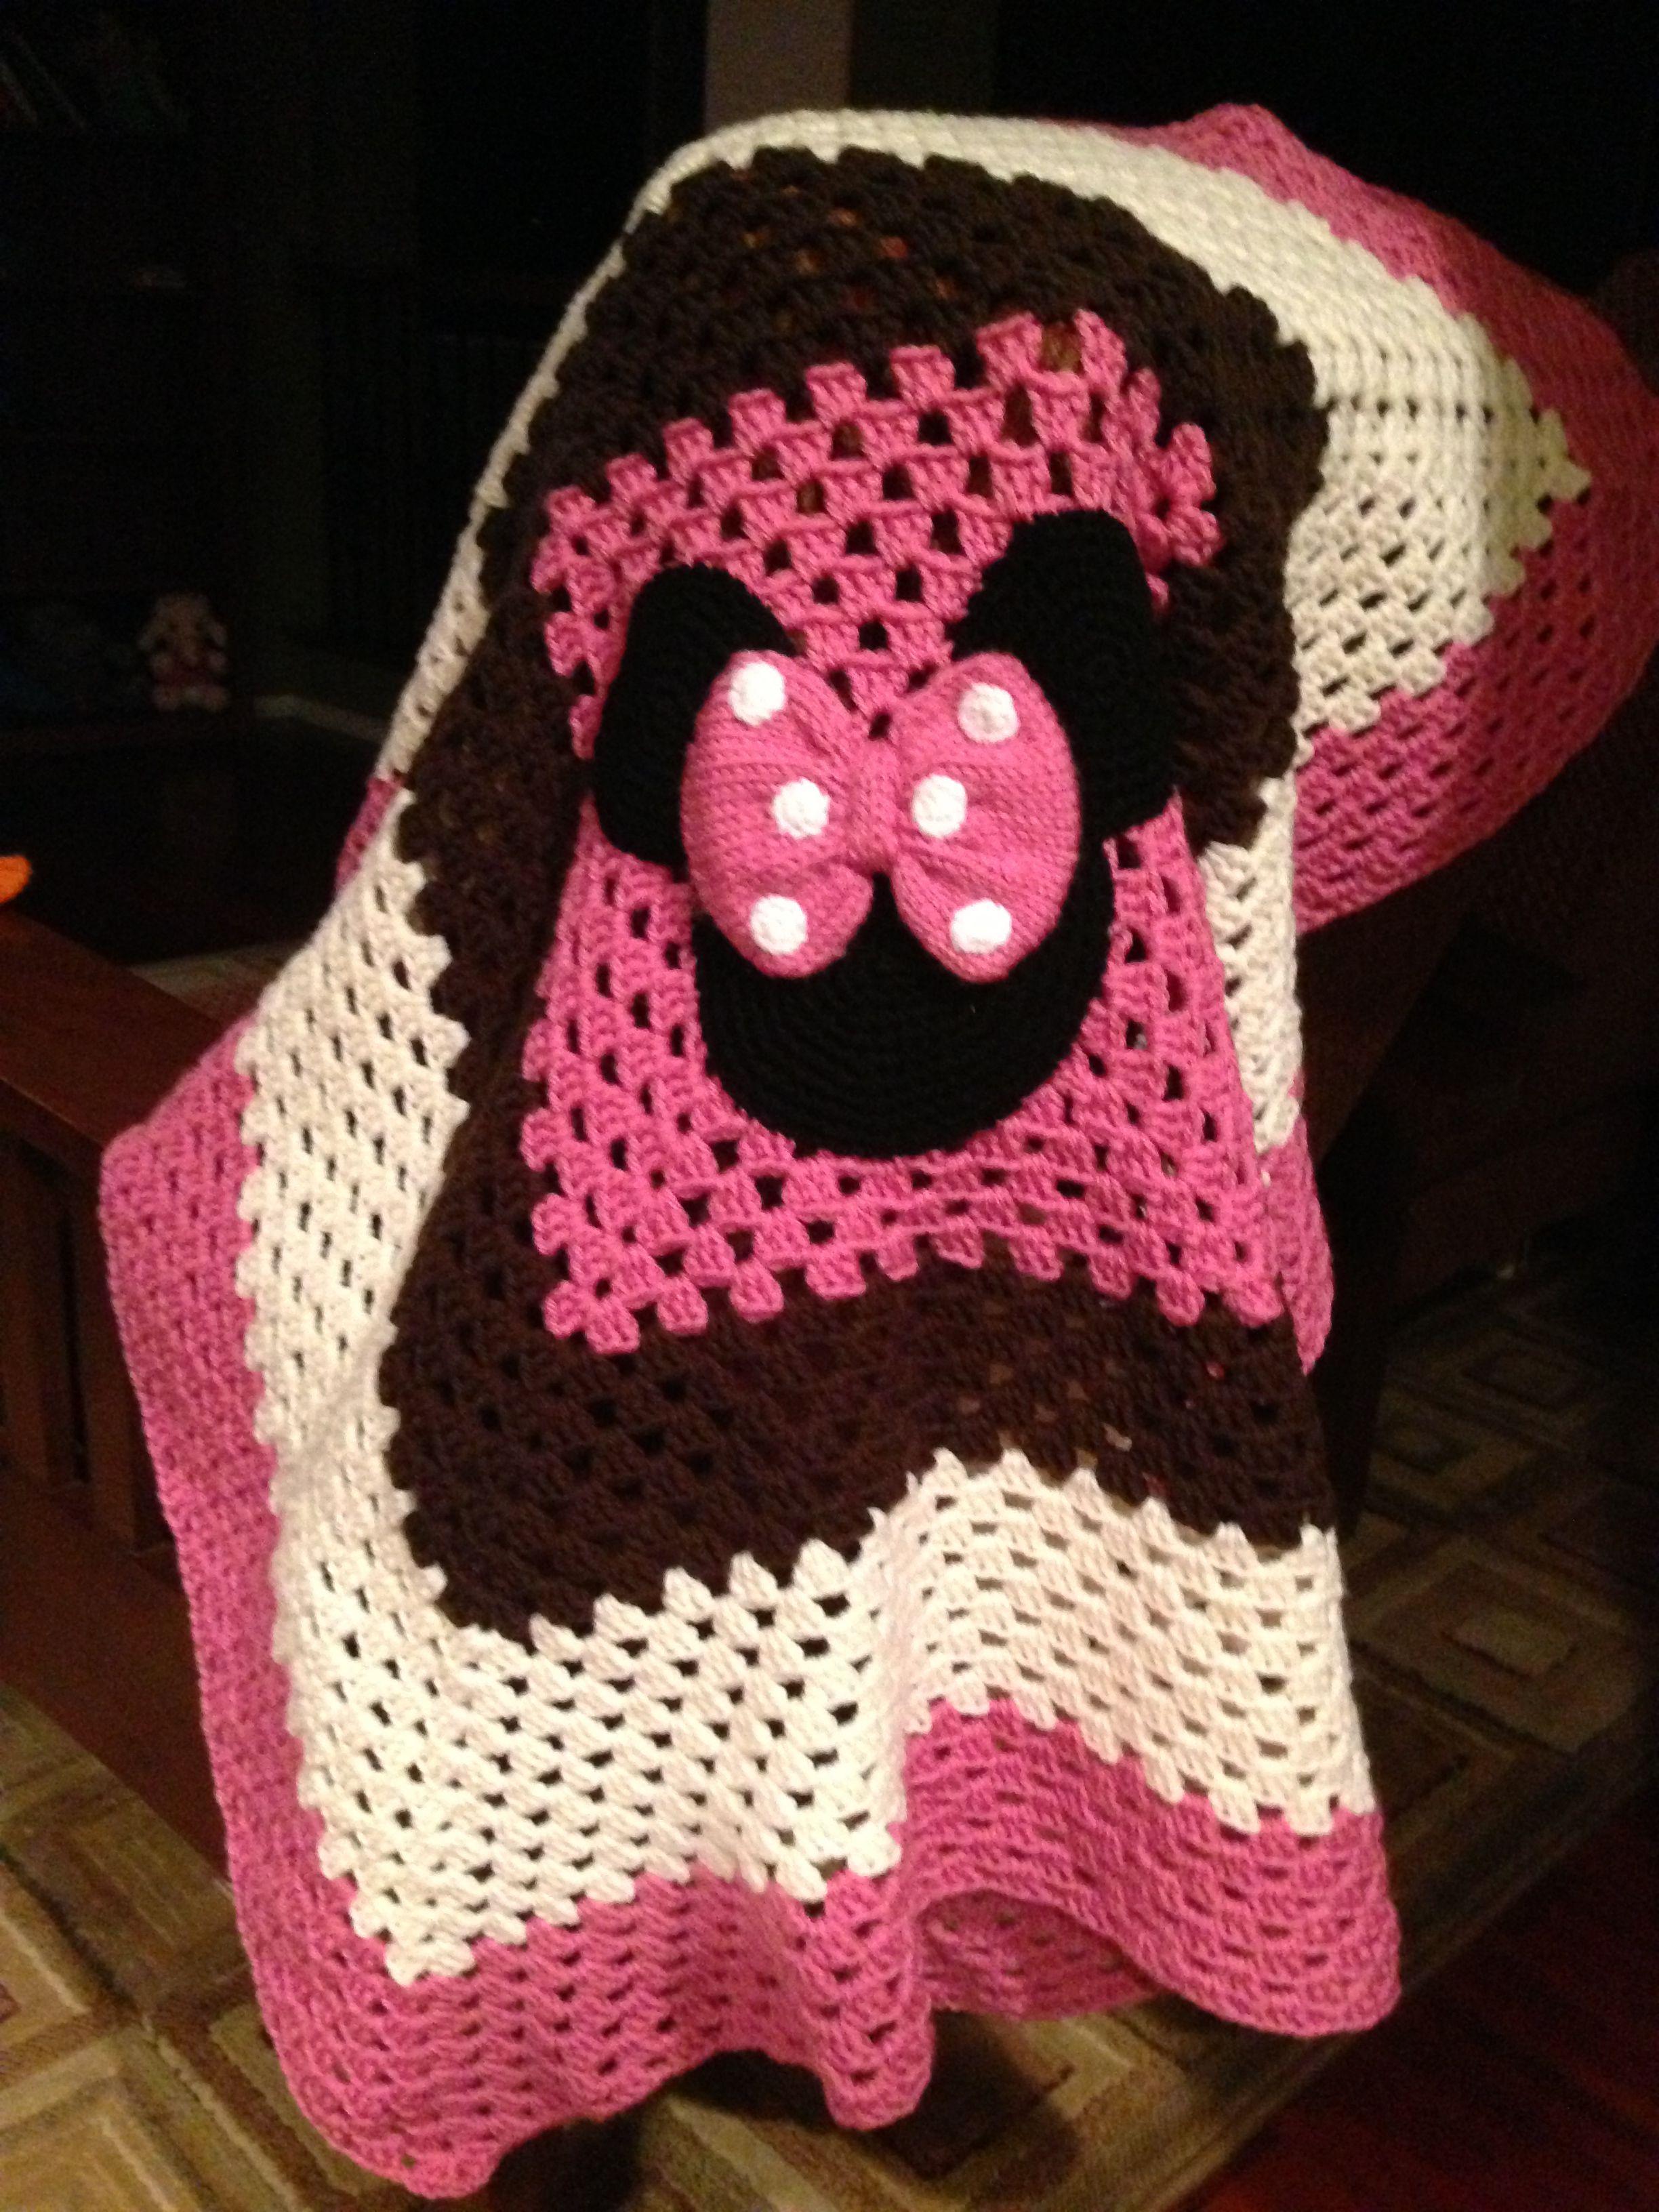 My Crochet Minnie Mouse baby blanket by Ana Perez | Crochet ...